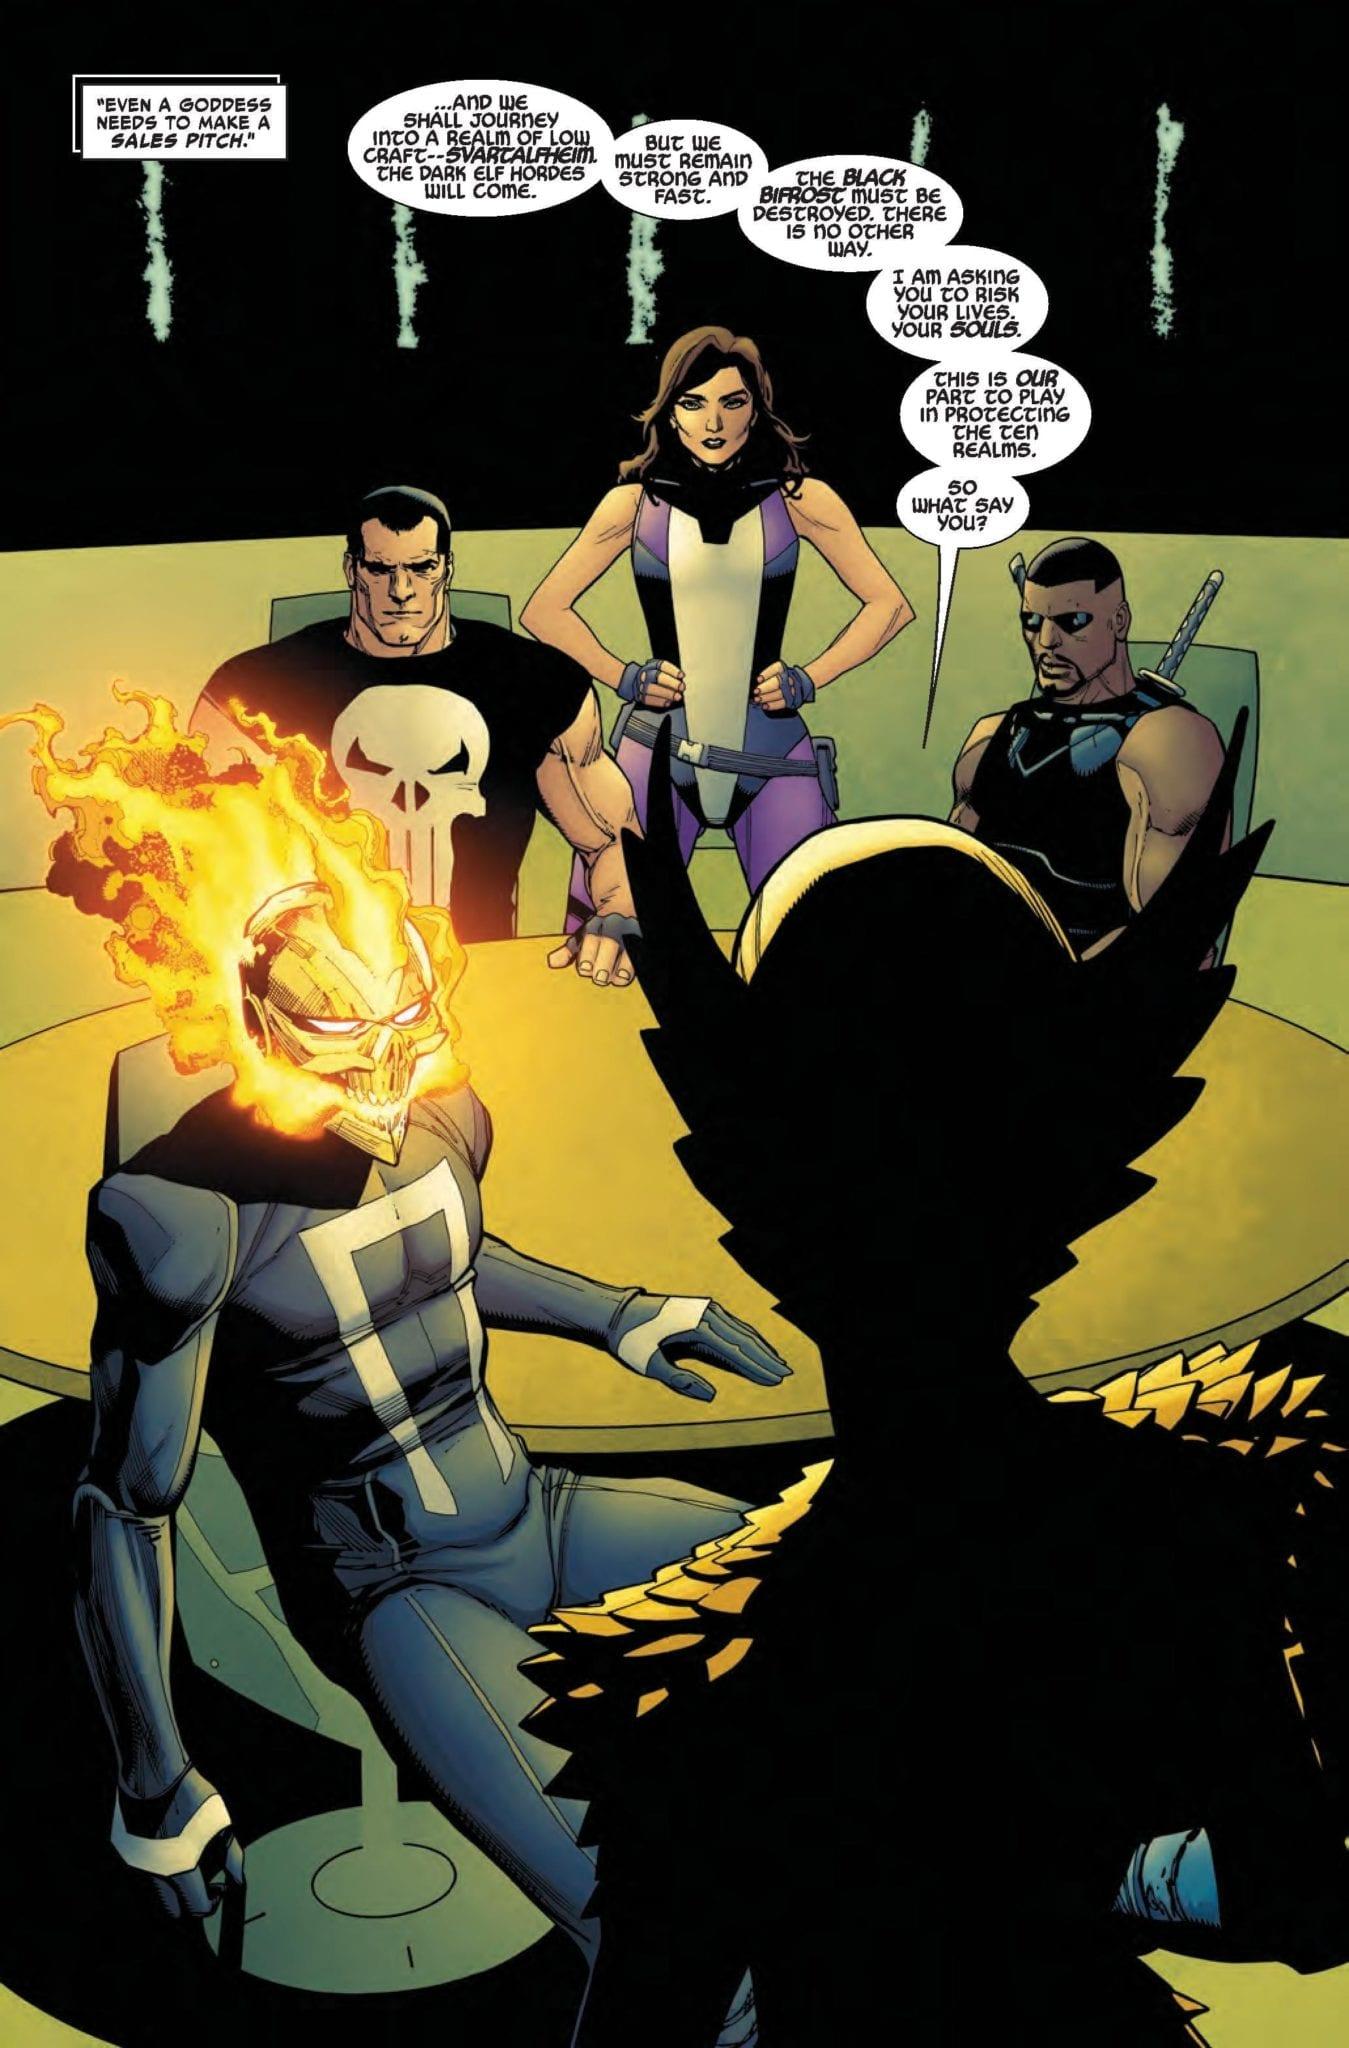 Exclusive Marvel Comics Preview: WAR OF REALMS STRIKEFORCE DARK ELF REALM #1